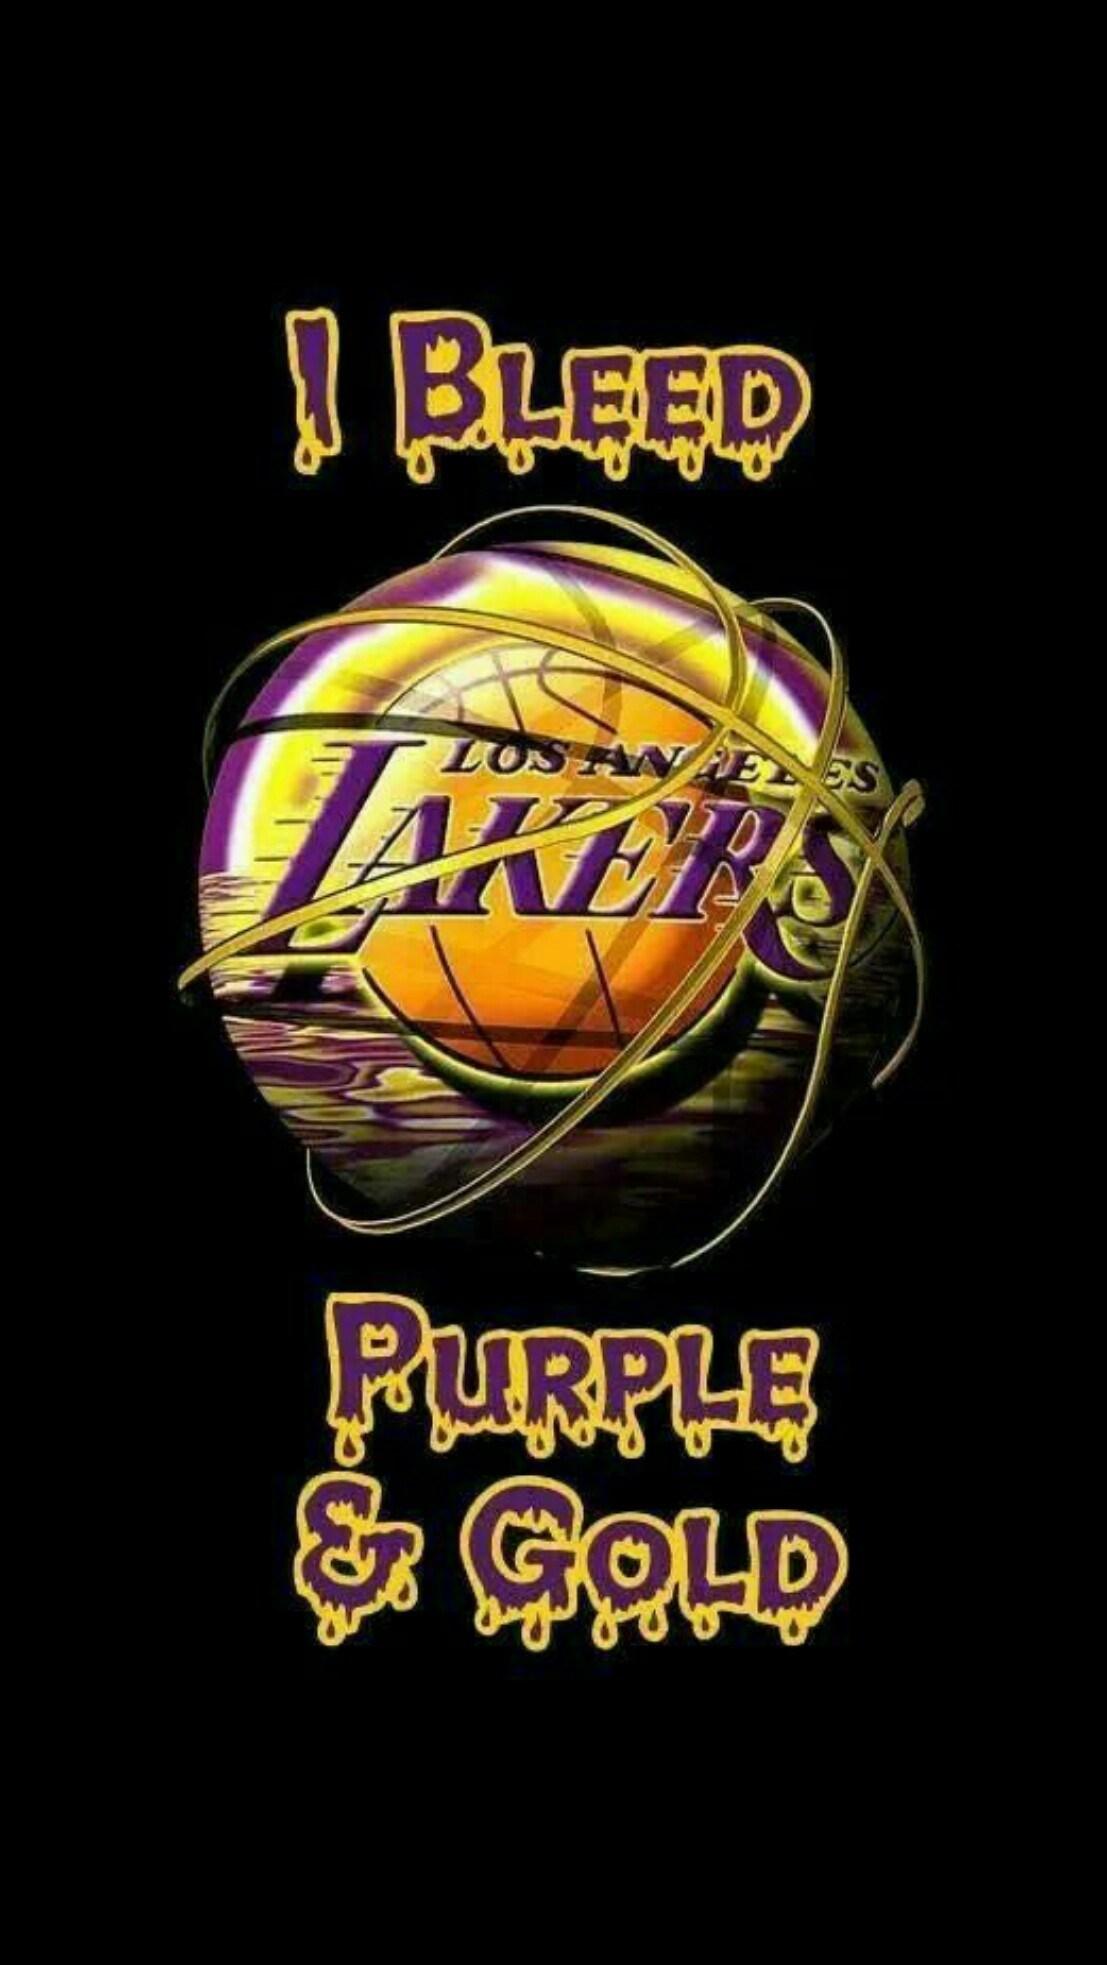 La Lakers Wallpaper For Iphone 1986586 Hd Wallpaper